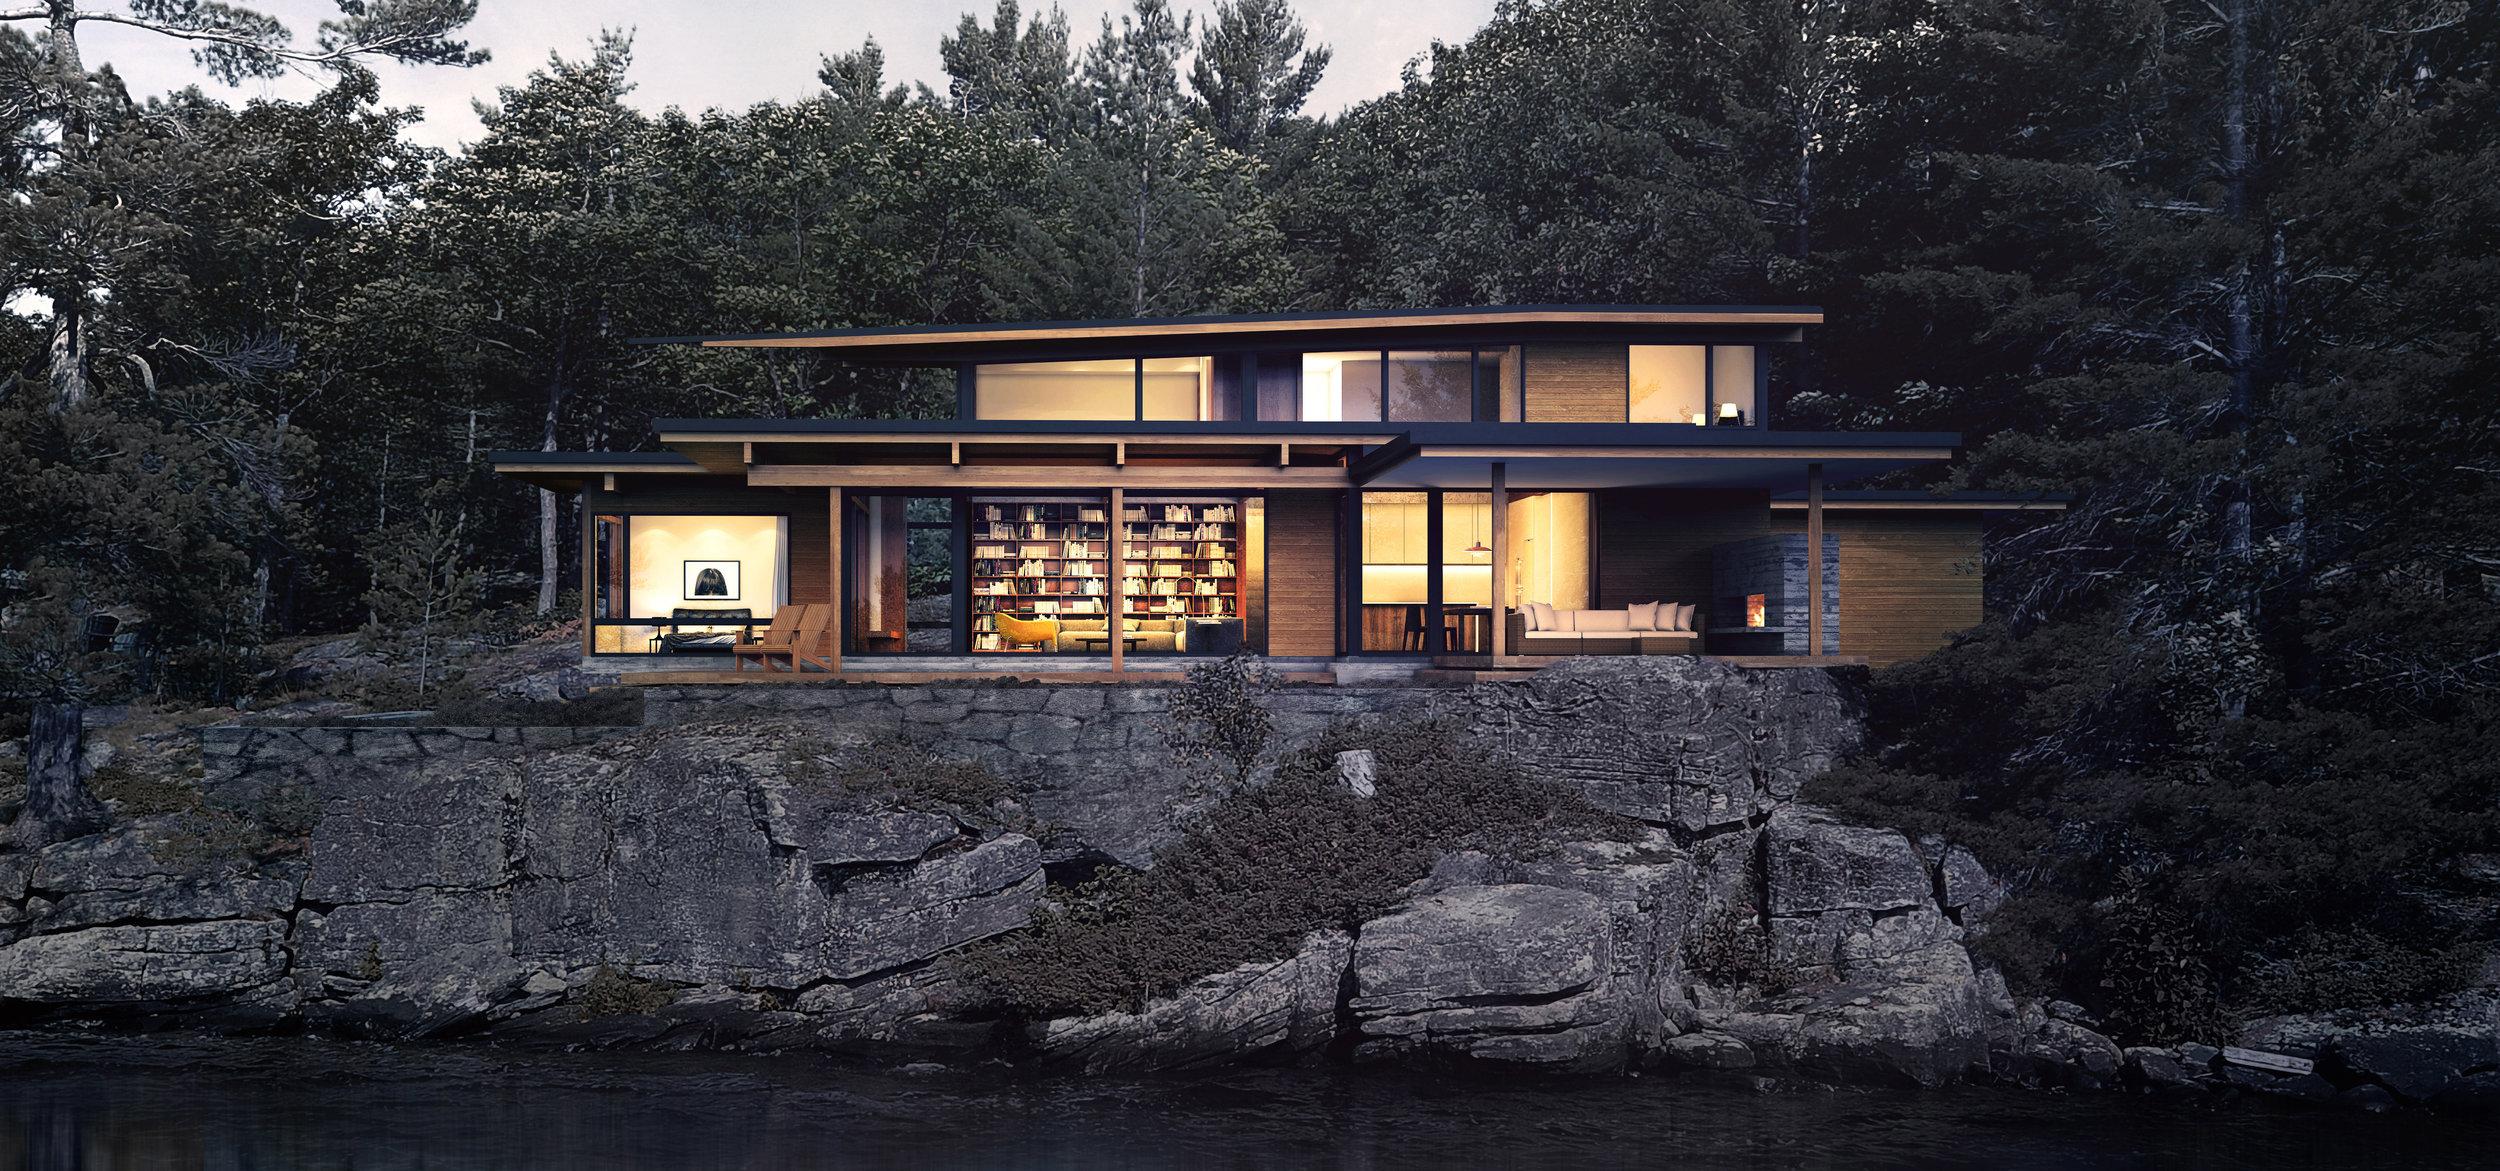 turkel_design_modern_prefab_home_axiom_series_rendering_axiom2650_exterior.jpg